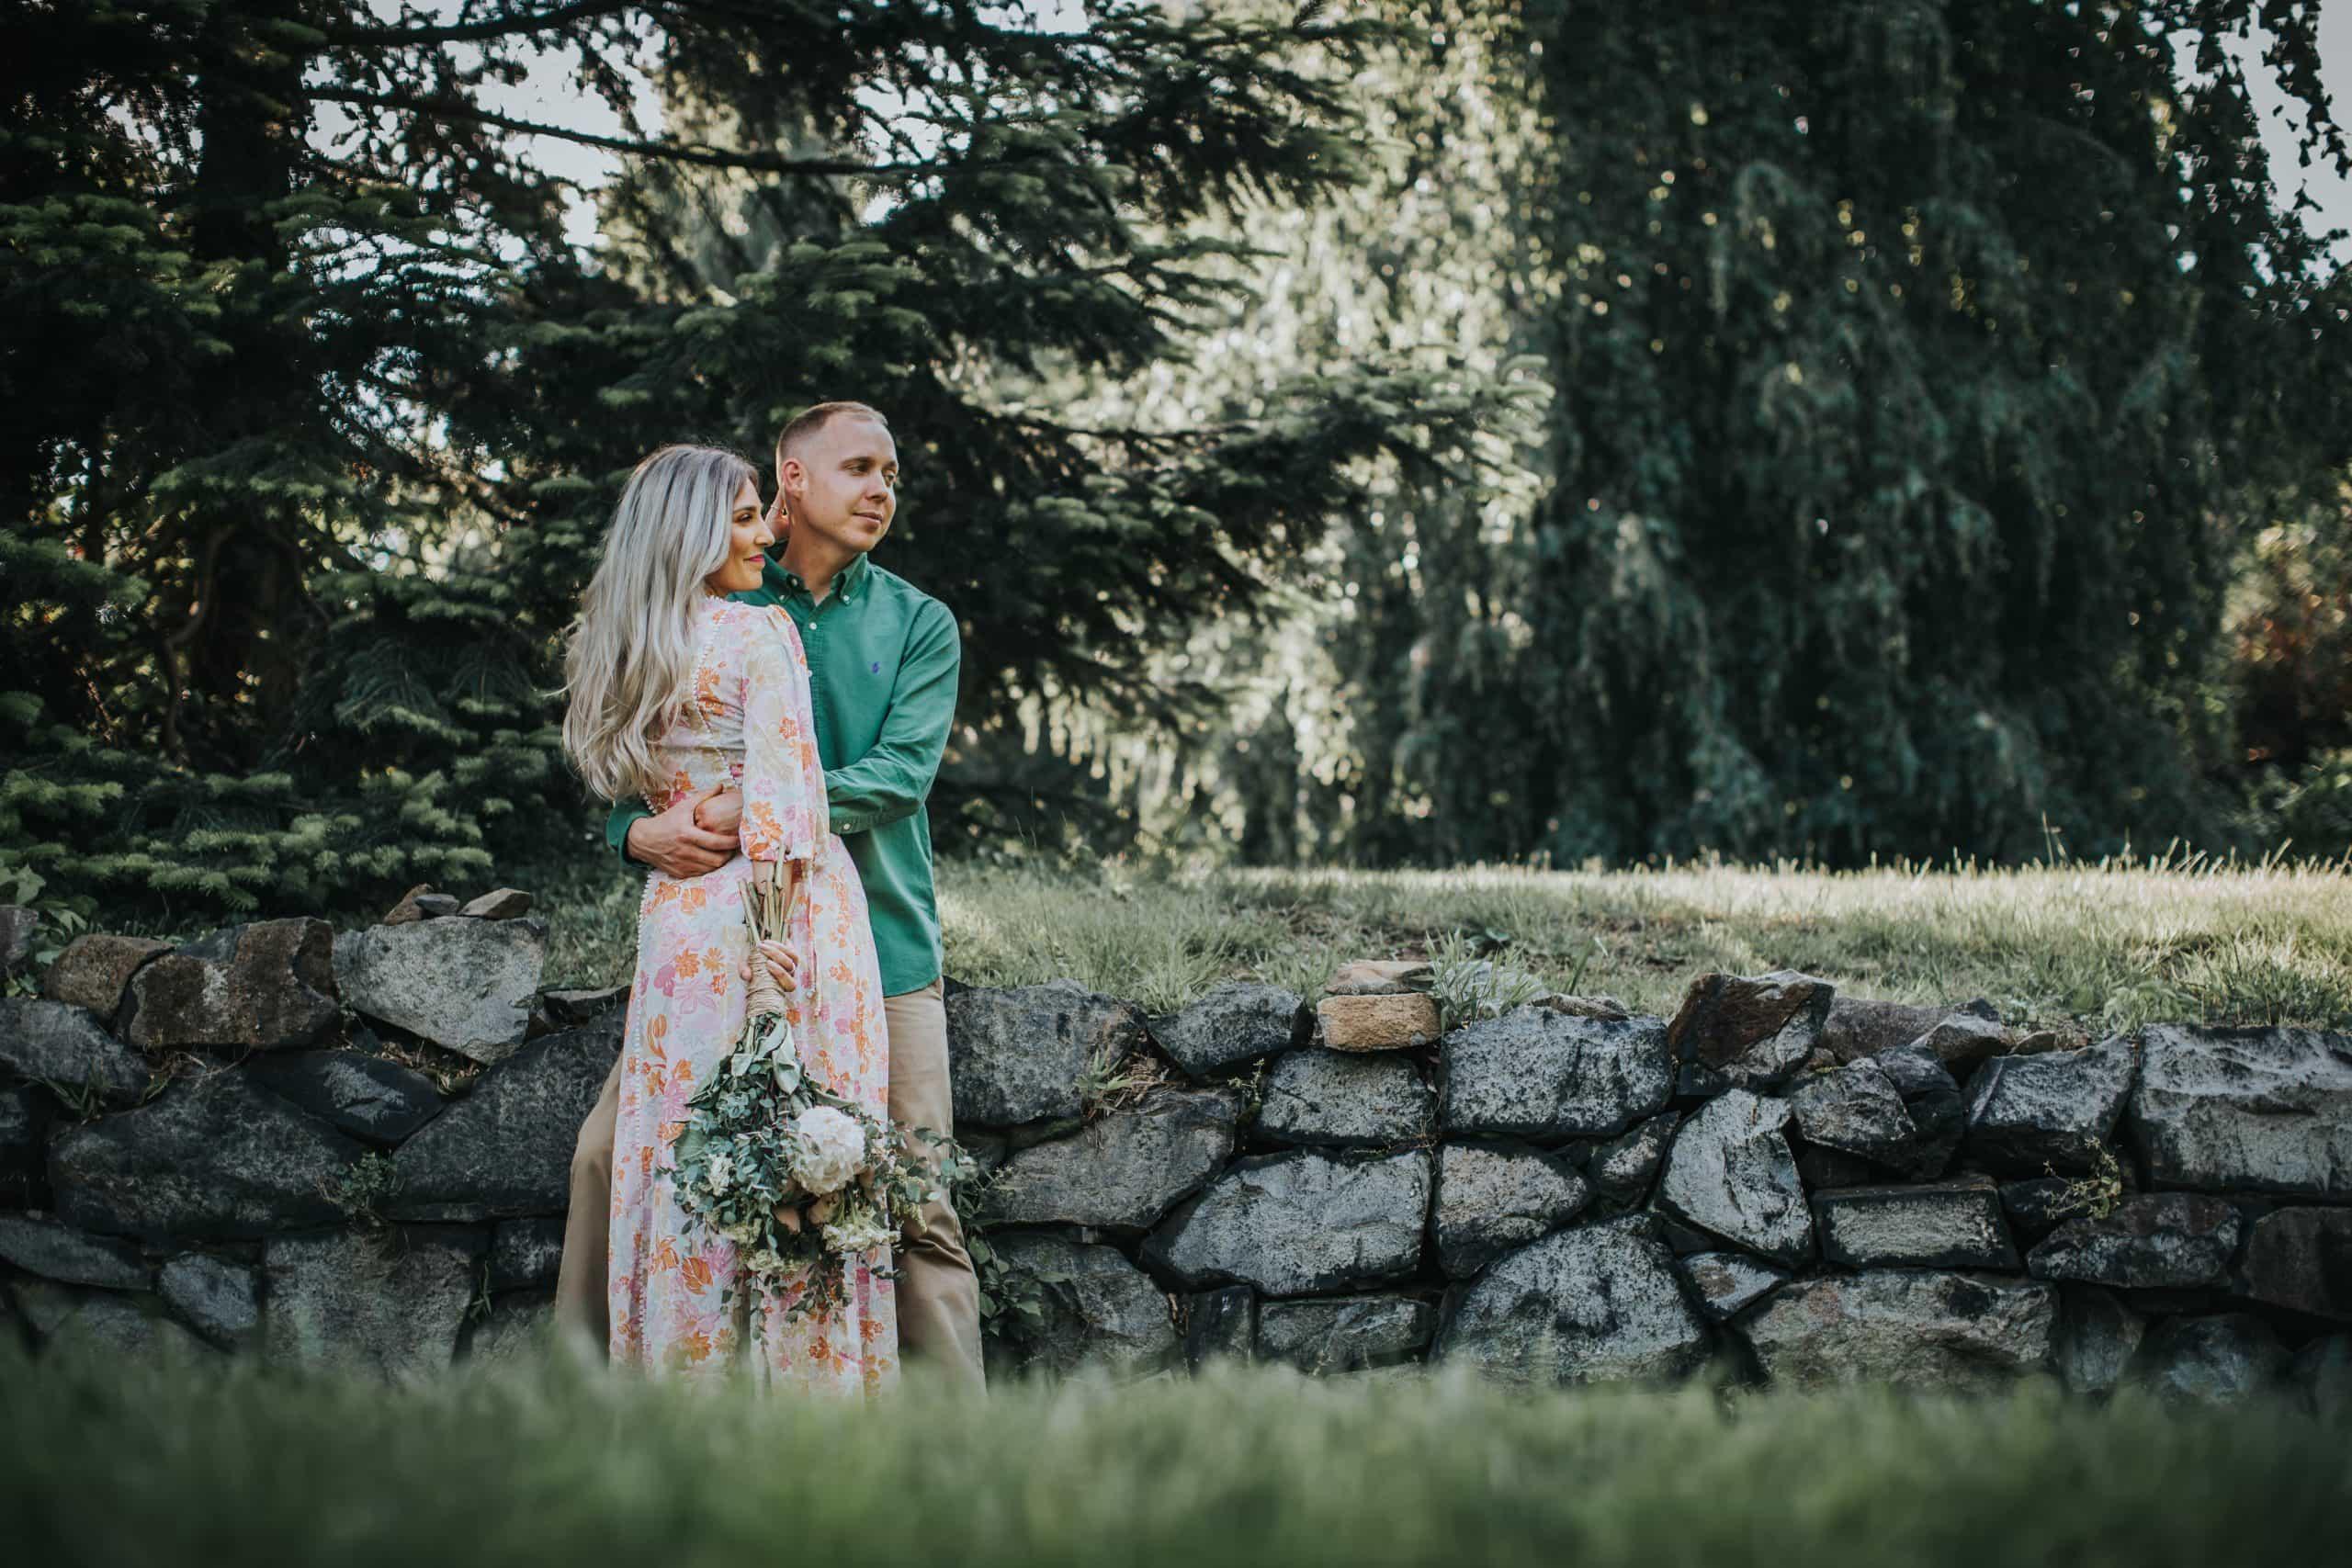 New-Jersey-Wedding-Photographer-Jenna-Lynn-Photography-Engagement-CarriageHouseRockwoodPark-30